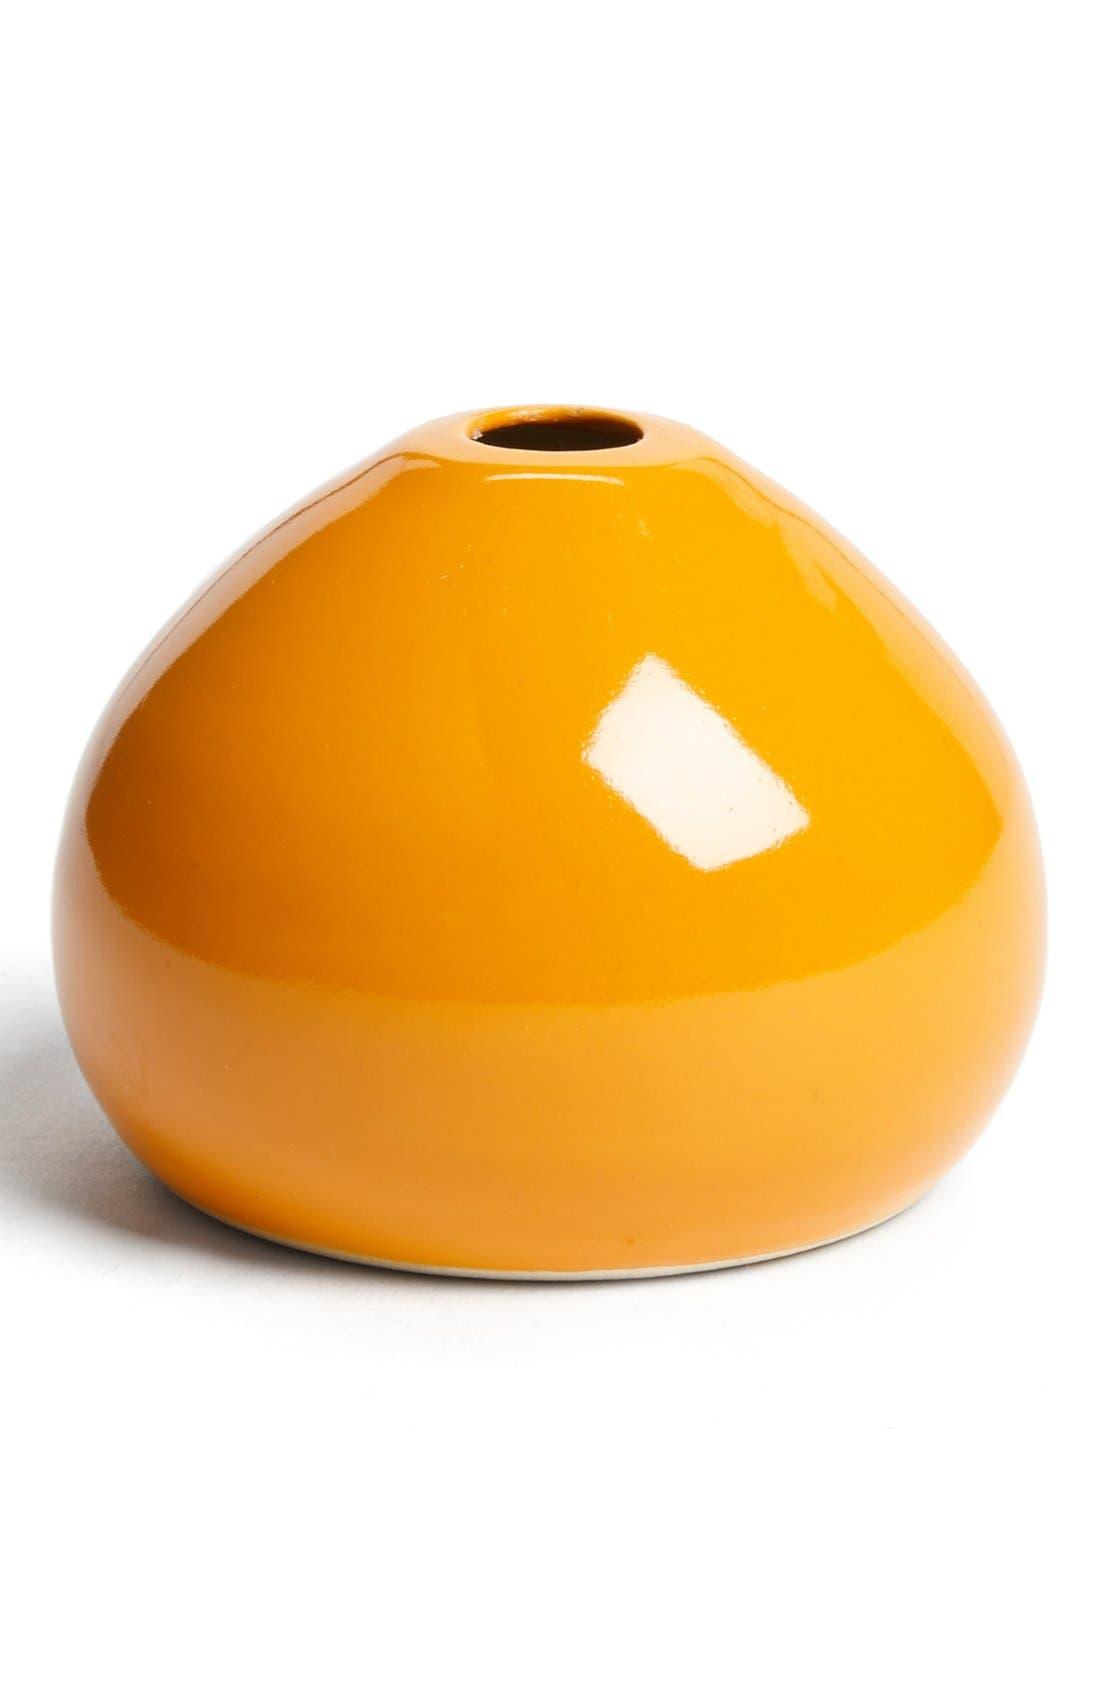 Alternate Image 1 Selected - Material Goods Pebble Vase